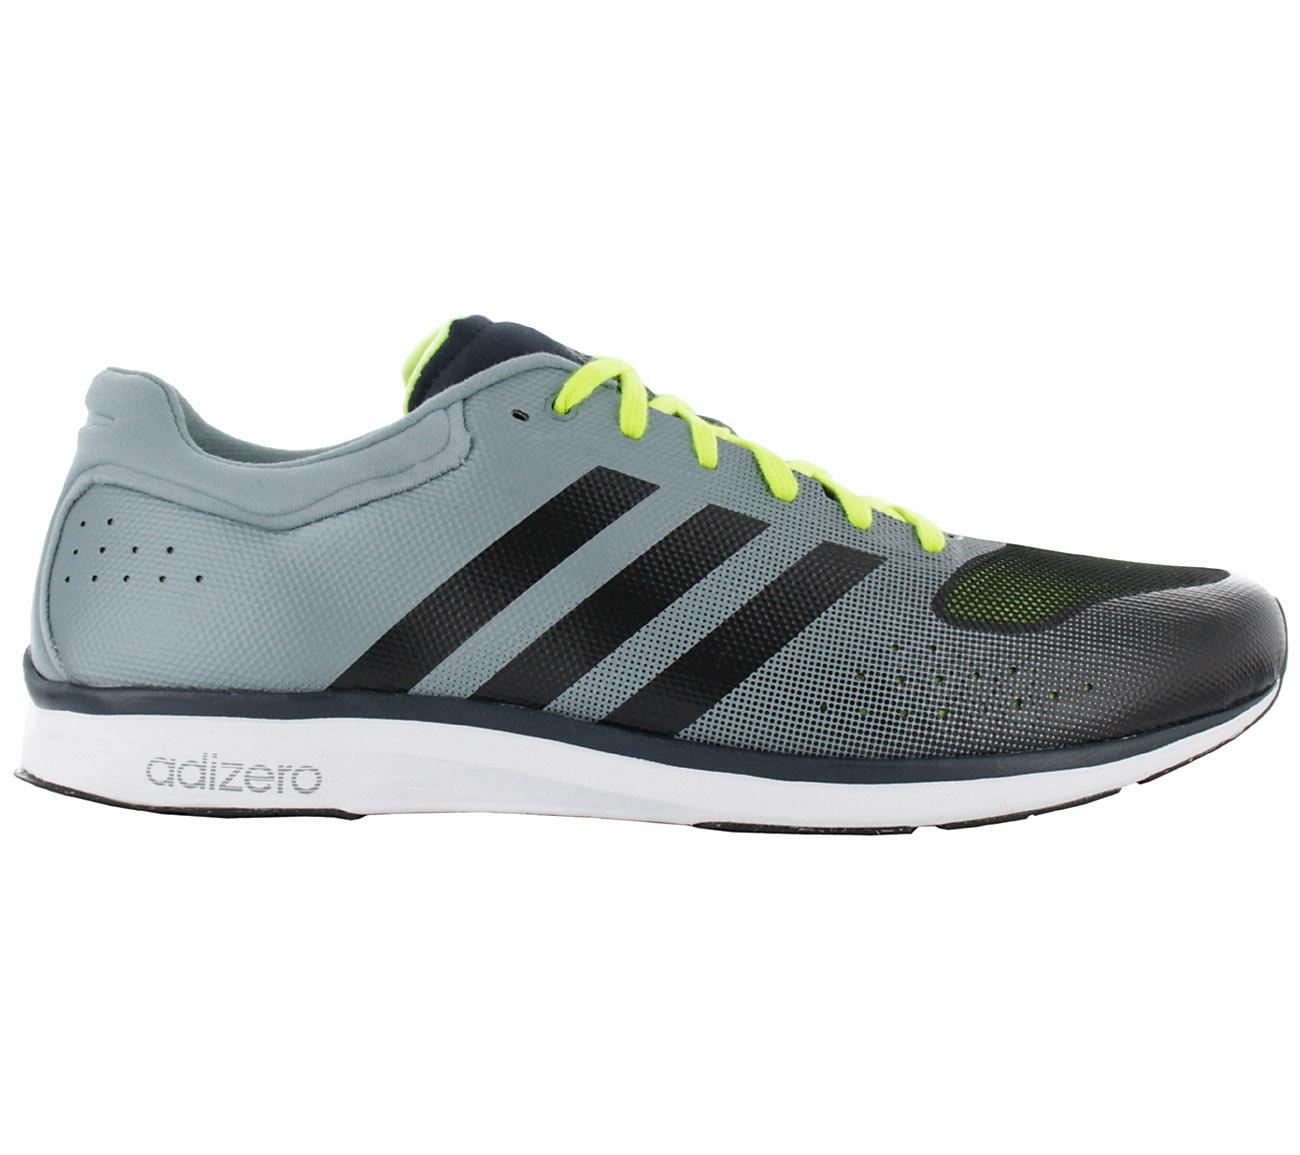 Details about Adidas Adizero F50 Rnr Shoes Men's Running Grey Training B22909 New